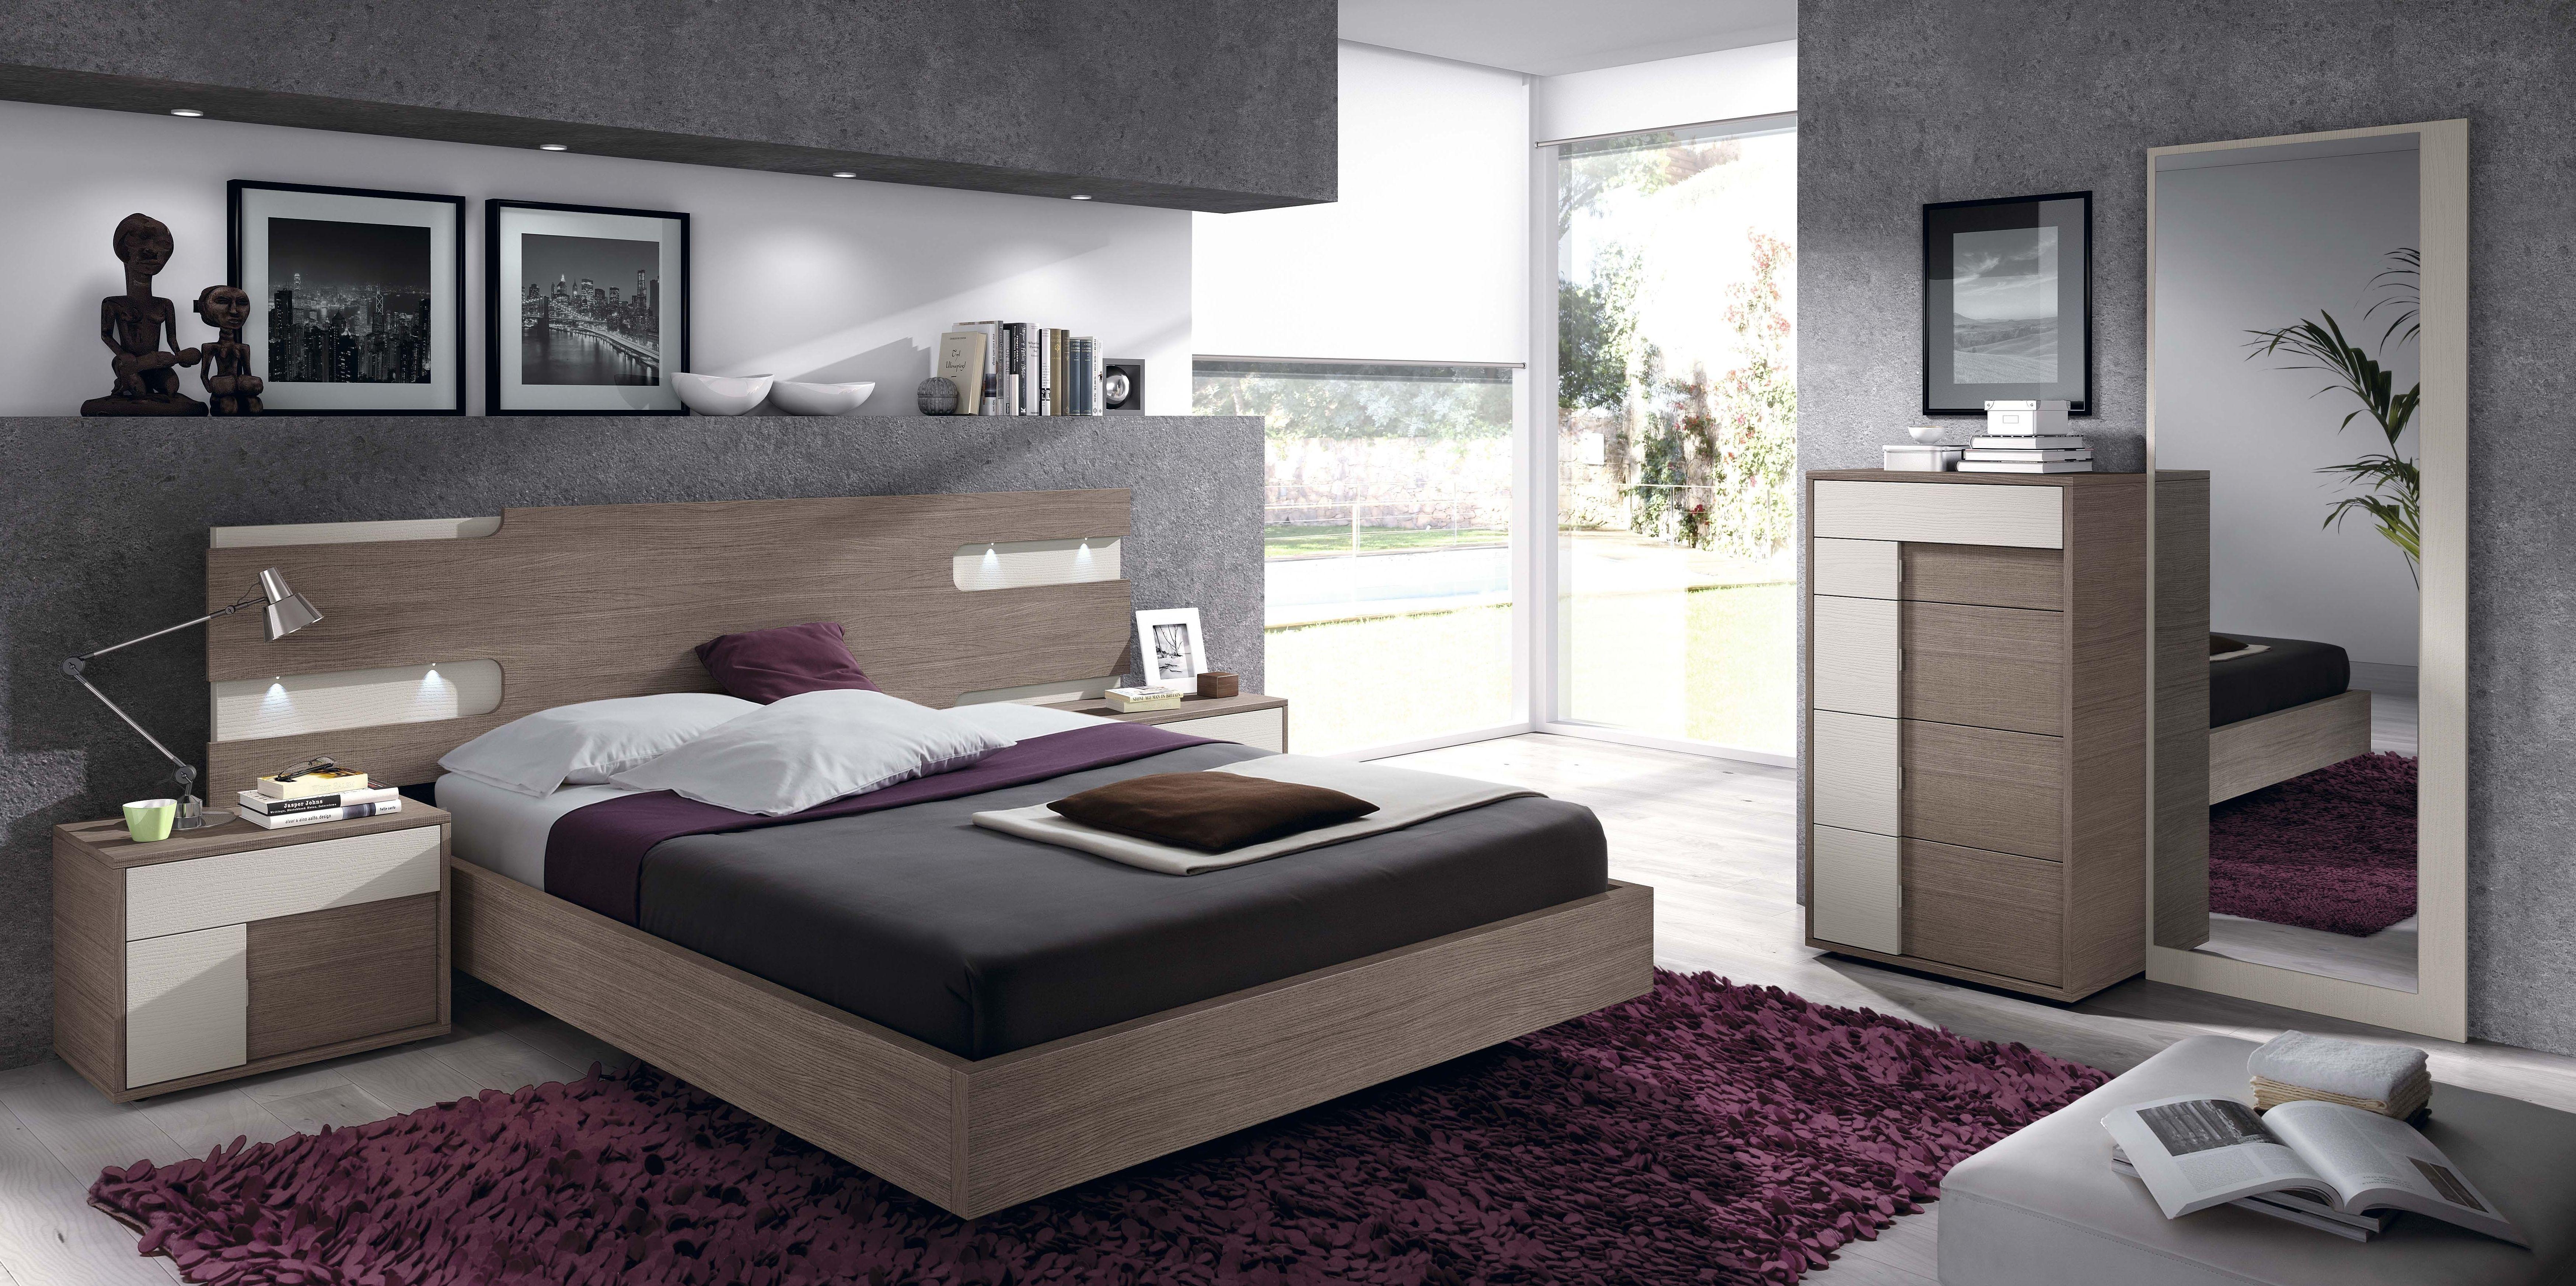 Sillones Para Dormitorios De Matrimonio. Finest Sillones Dormitorio ...